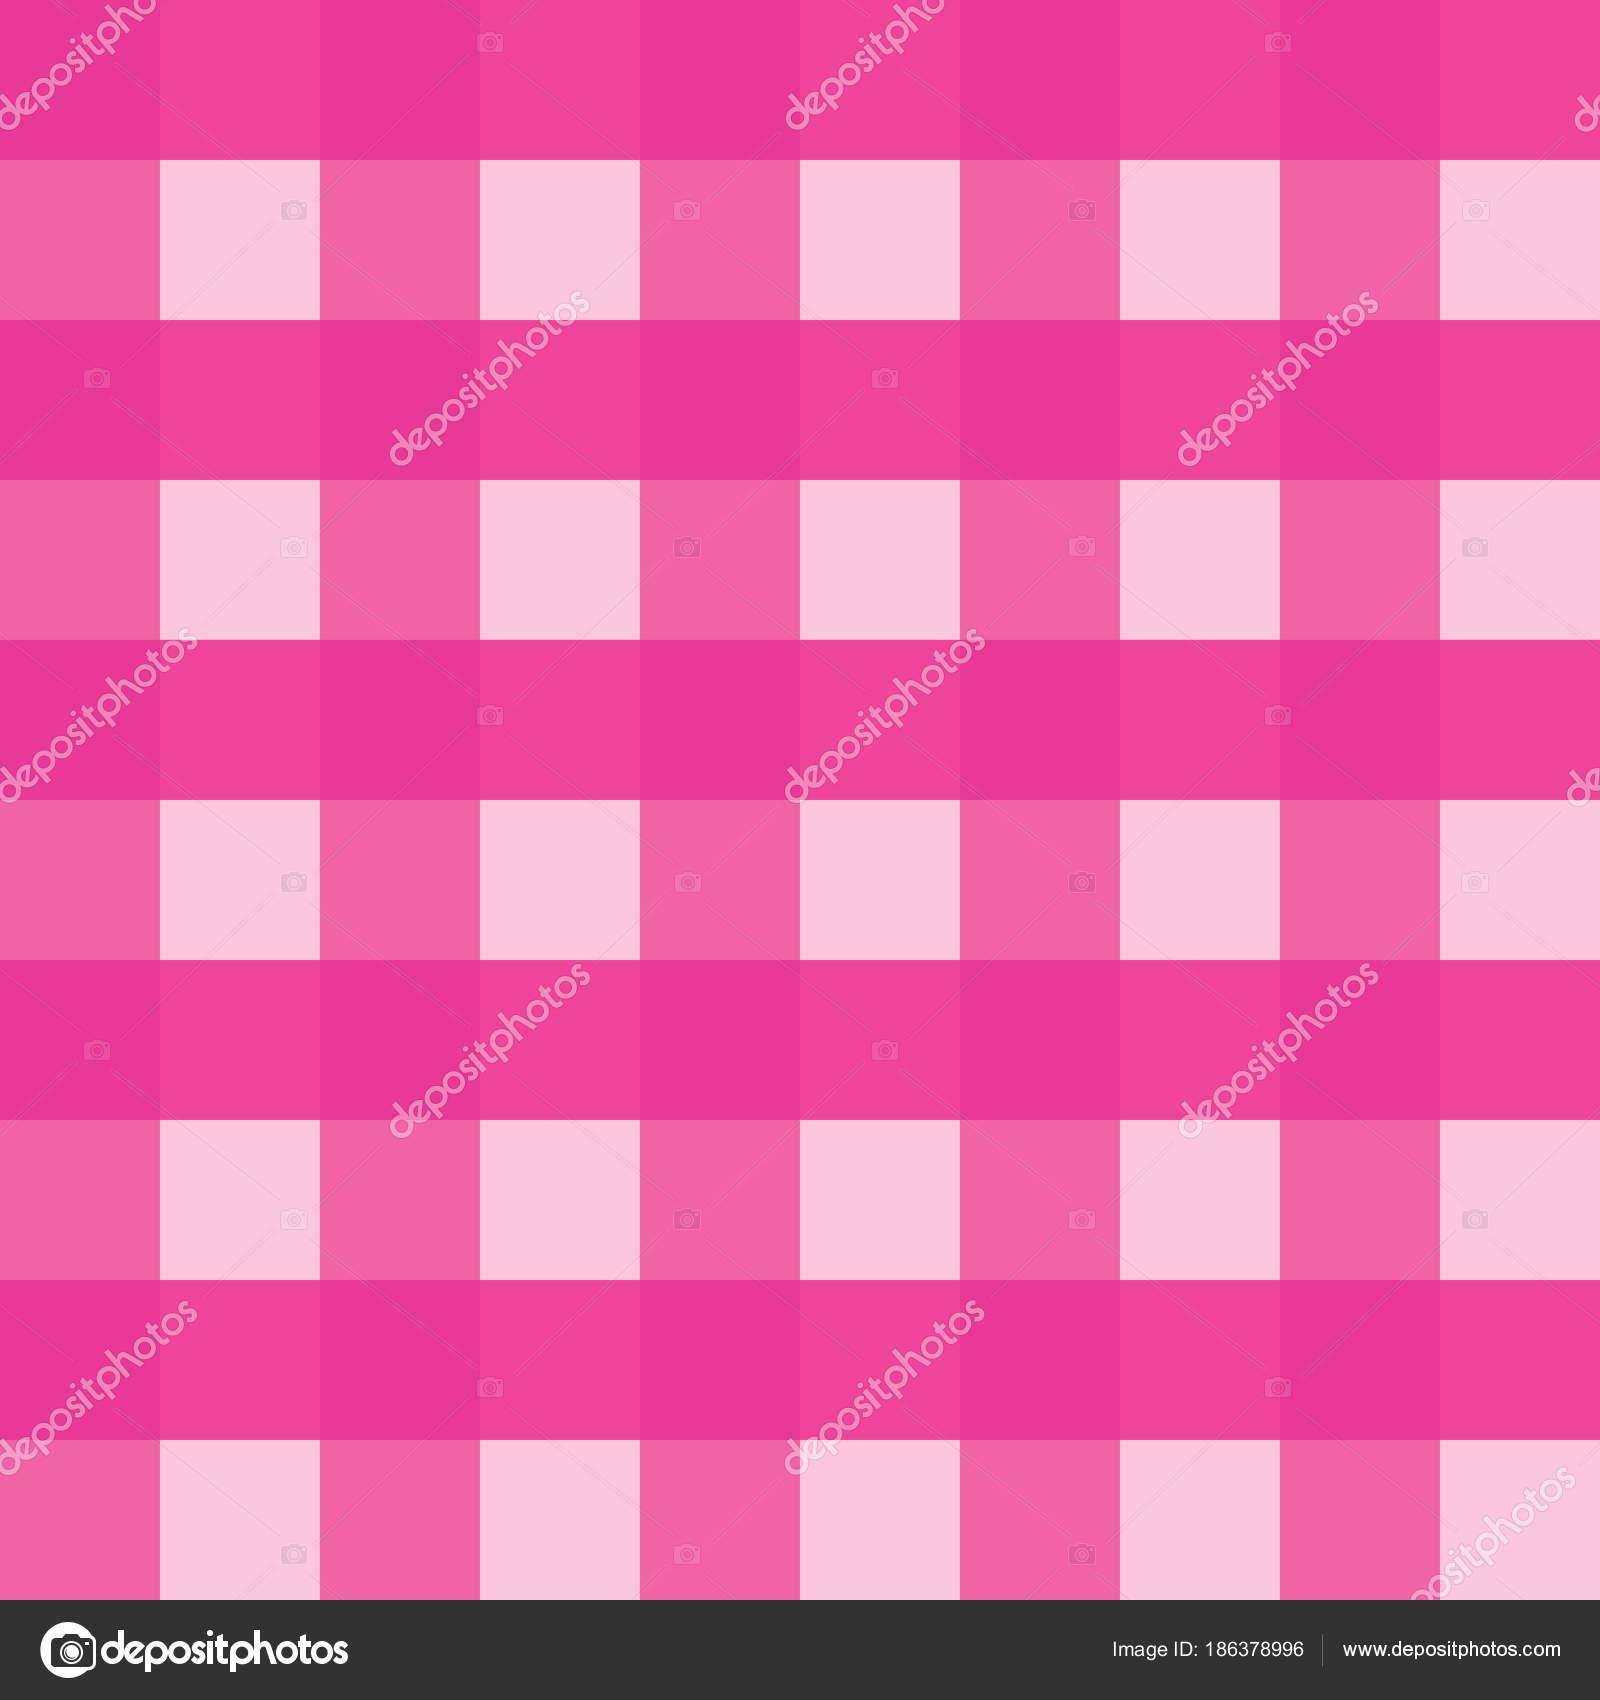 f8d771a2b85 Σχεδιασμός Πατρόν ροζ καρό απρόσκοπτη διάνυσμα φόντο. Υφή από ρόμβος ή  τετράγωνα για καρό, τραπεζομάντιλα, ρούχα, μπλούζες, φορέματα, χαρτί και  άλλα ...